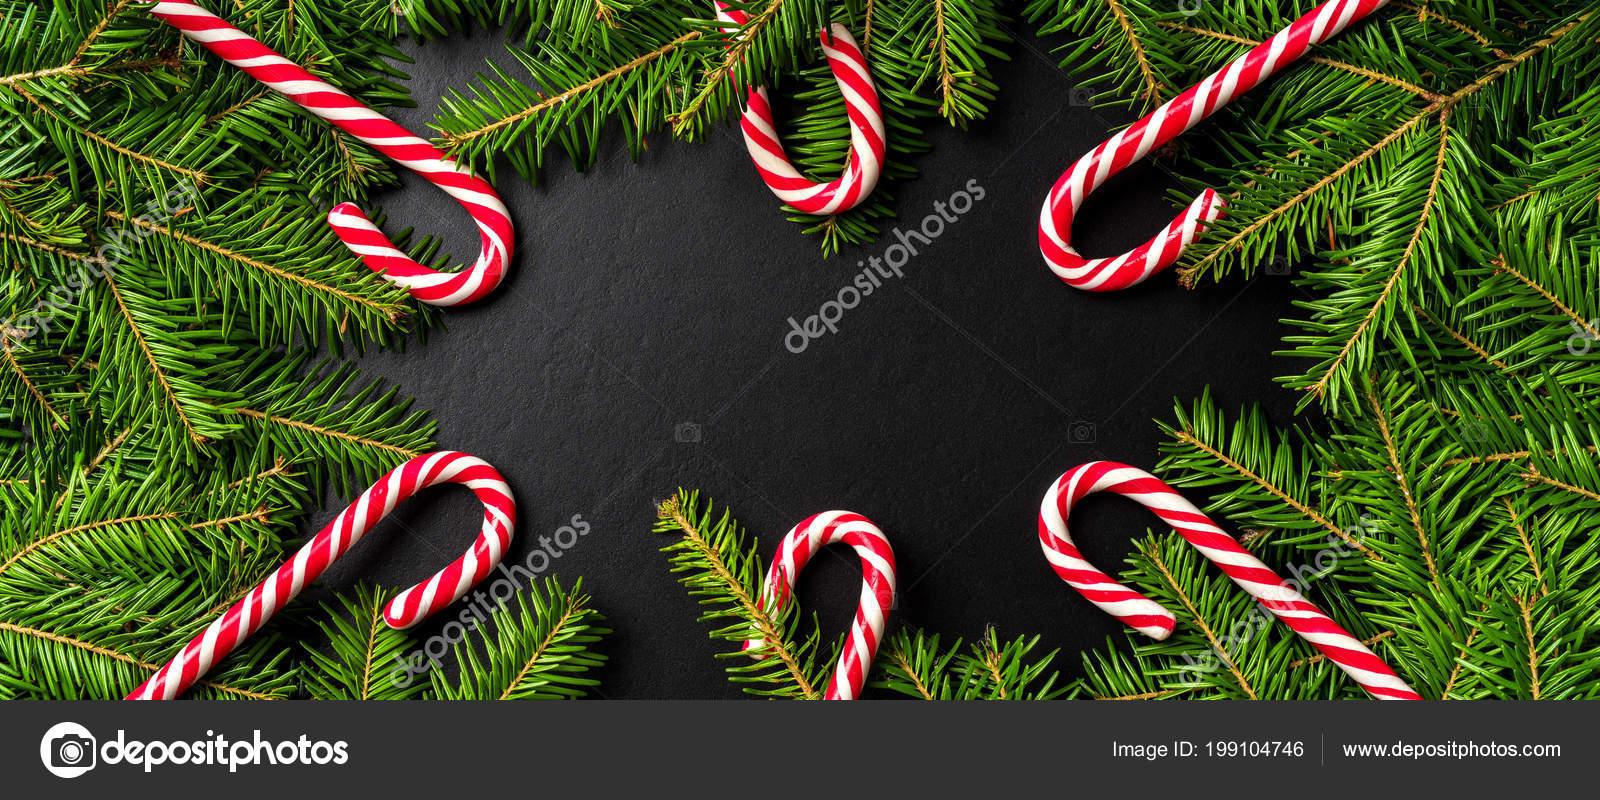 Christmas Tree Top View.Christmas Background Candy Canes Christmas Tree Top View